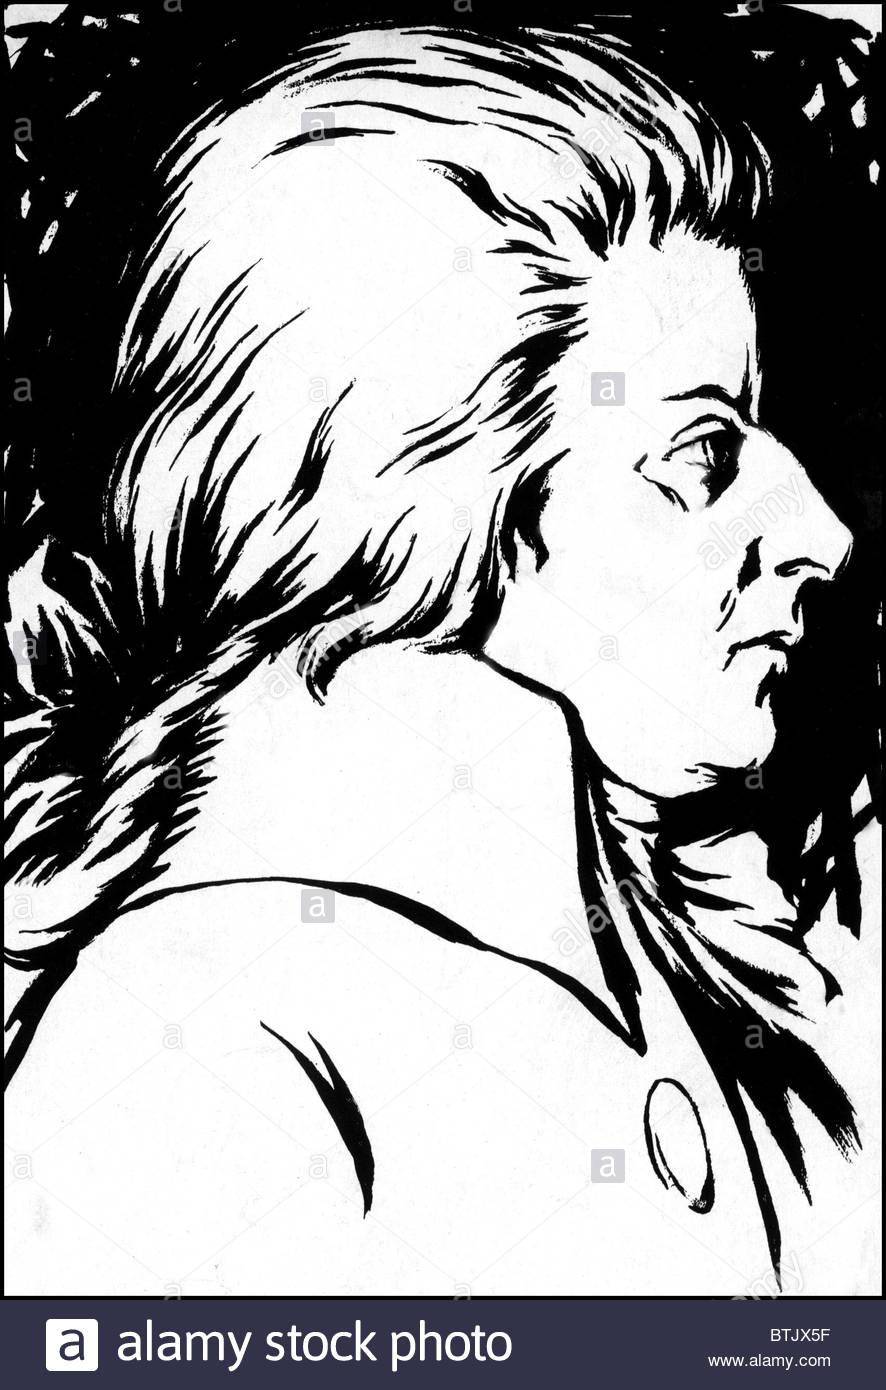 886x1390 Wolfgang Amadeus Mozart, Painted Around 1786 Stock Photo, Royalty